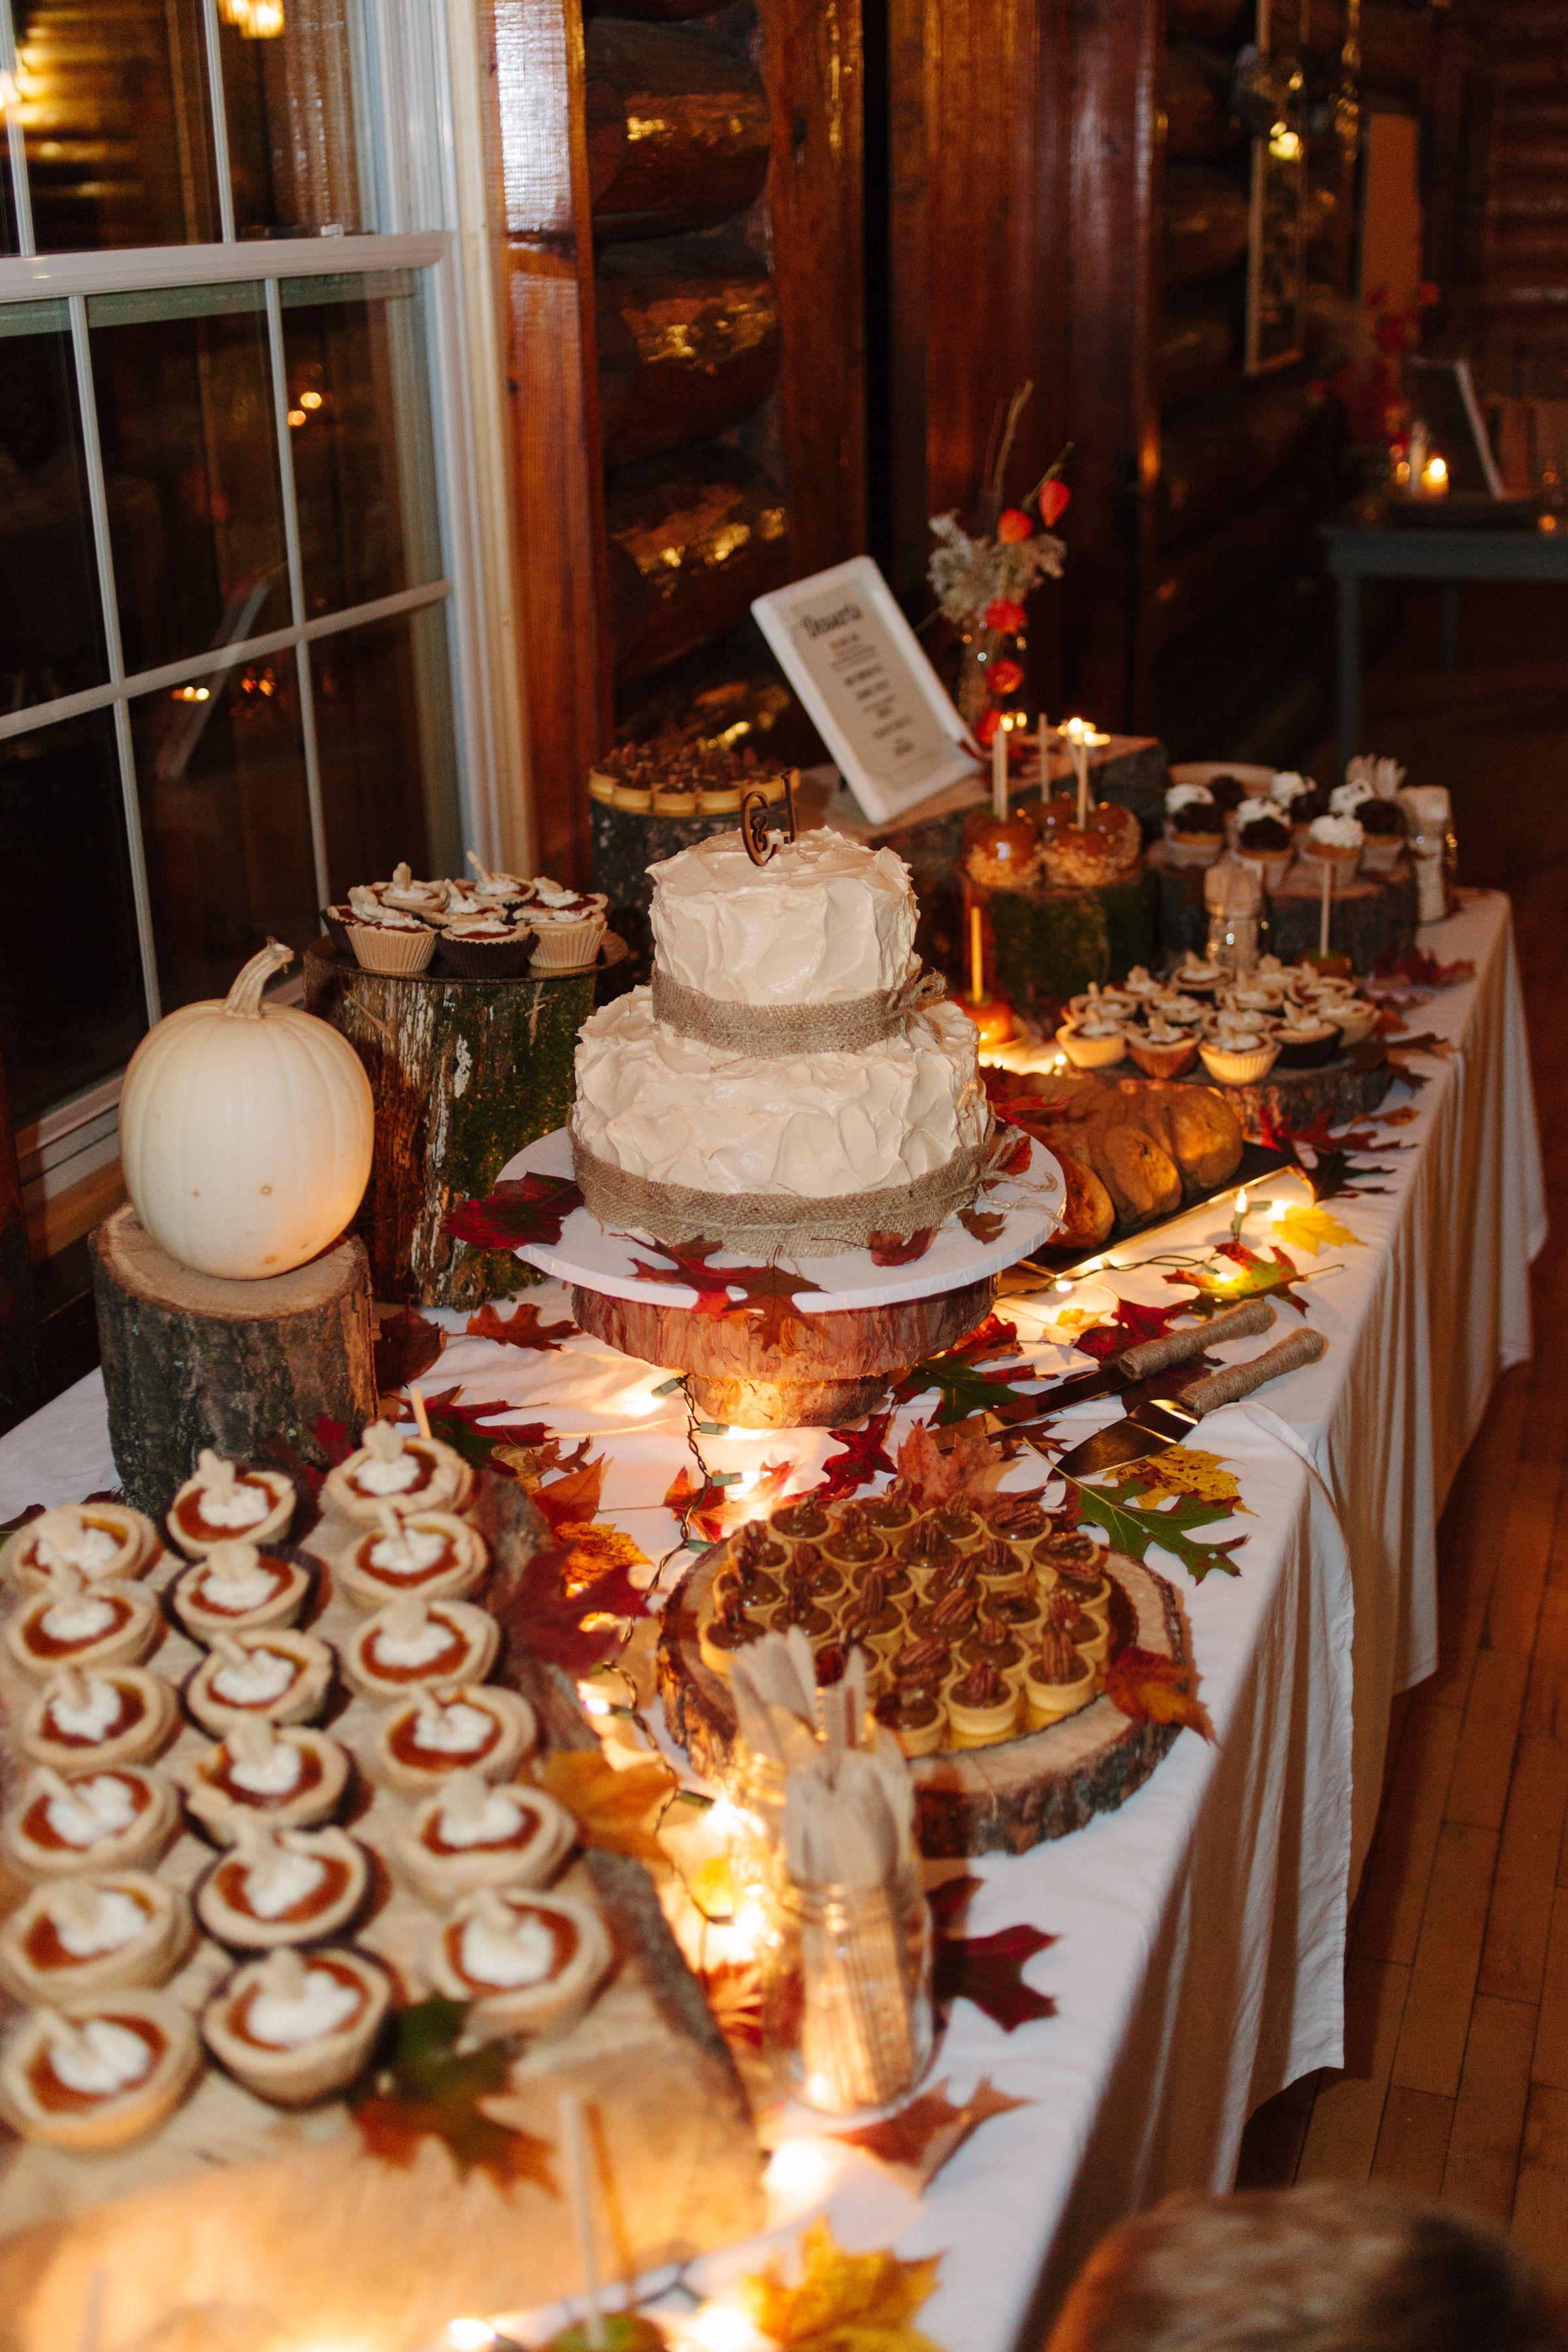 Fall Wedding Dessert Table Our Fall Wedding Ideas